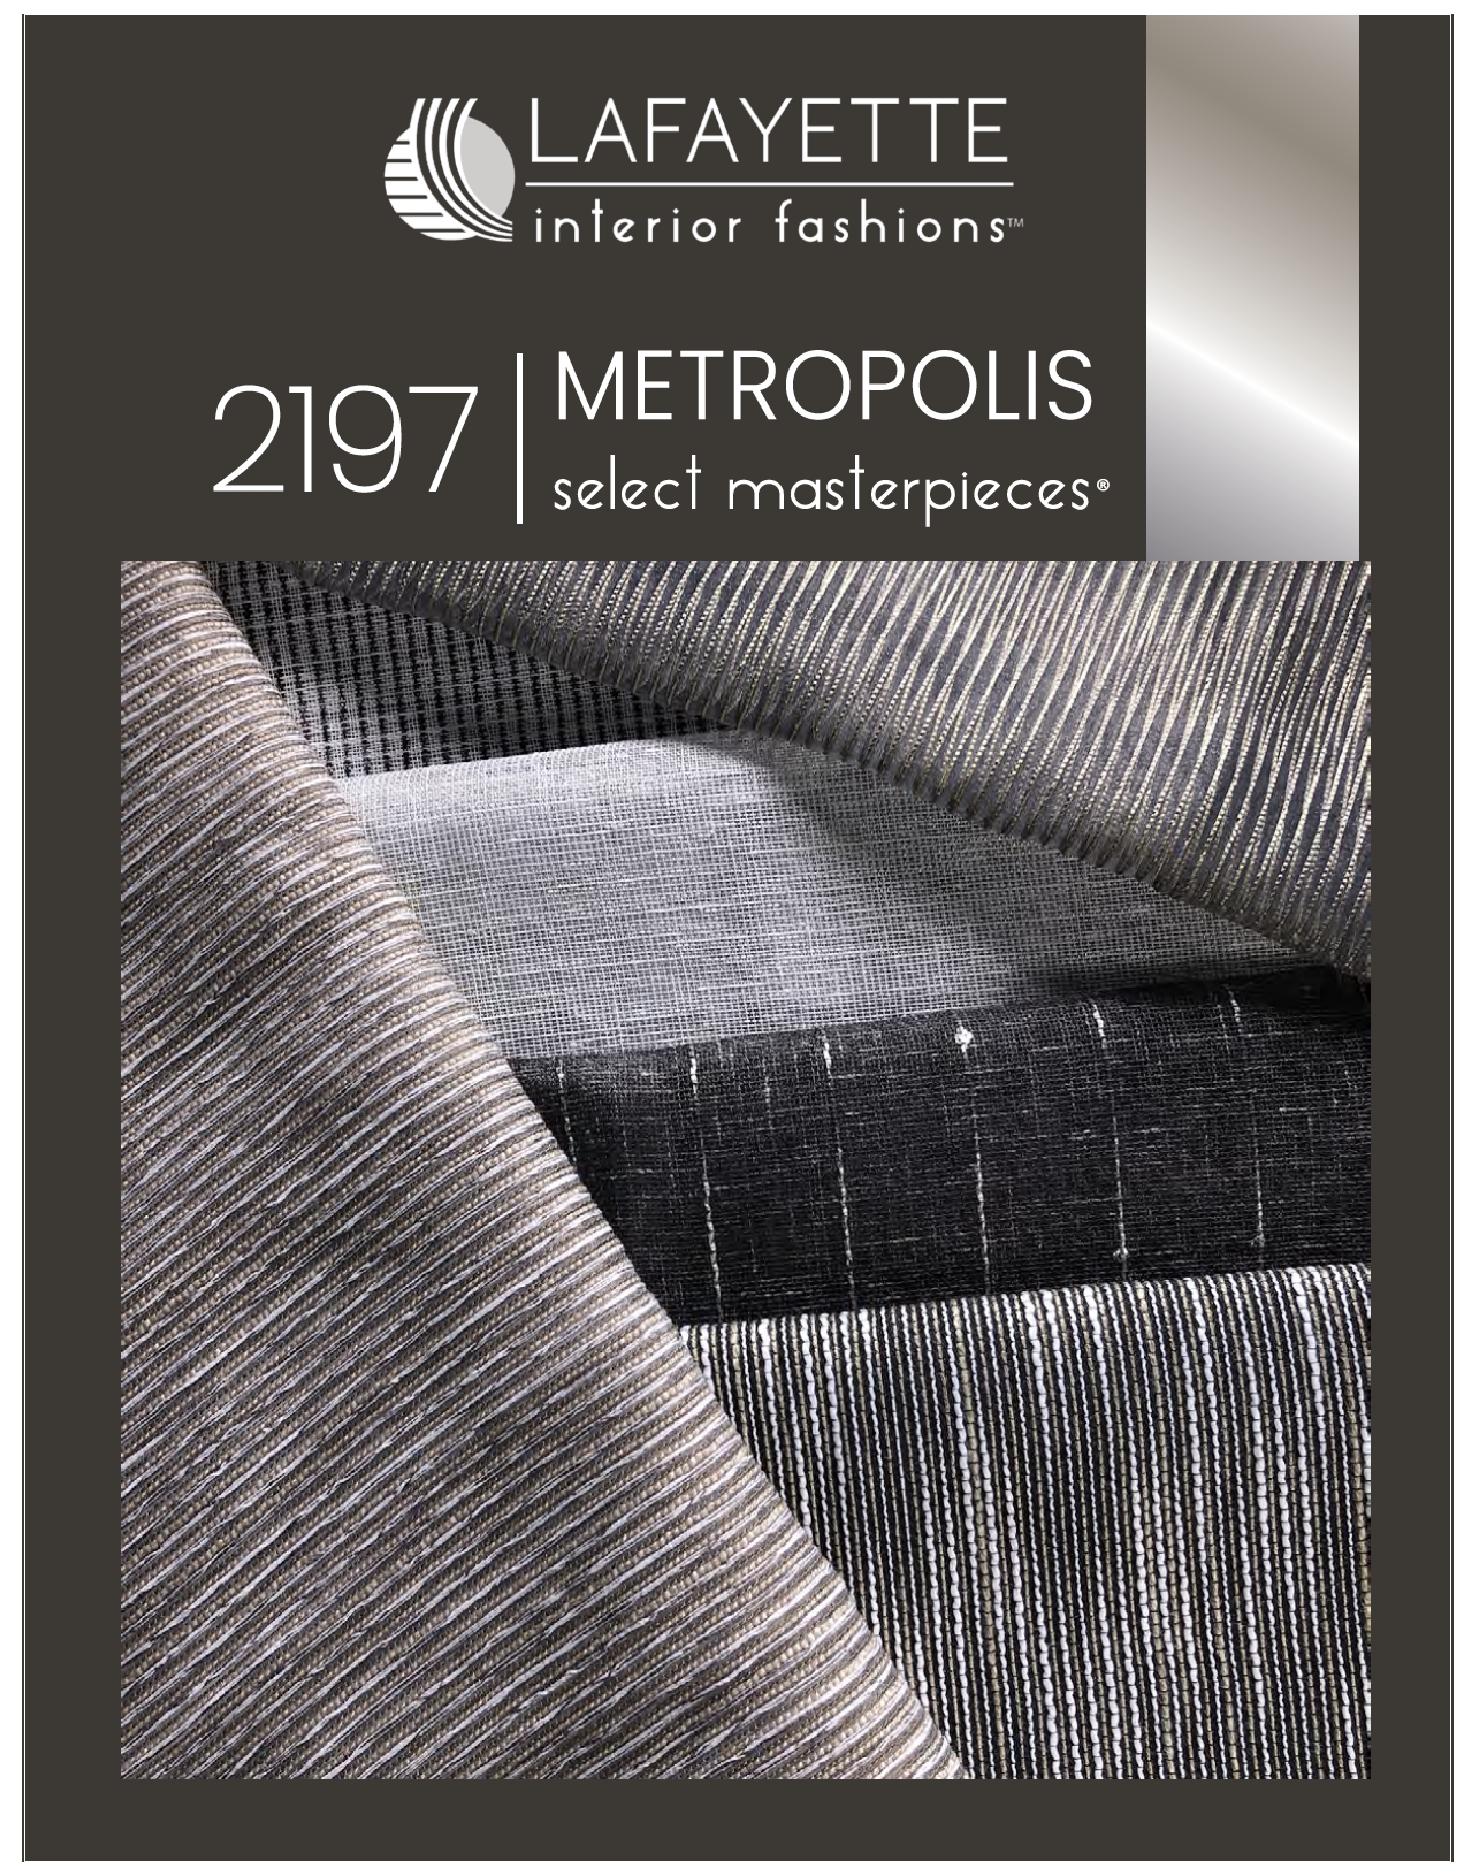 Metropolis 2197